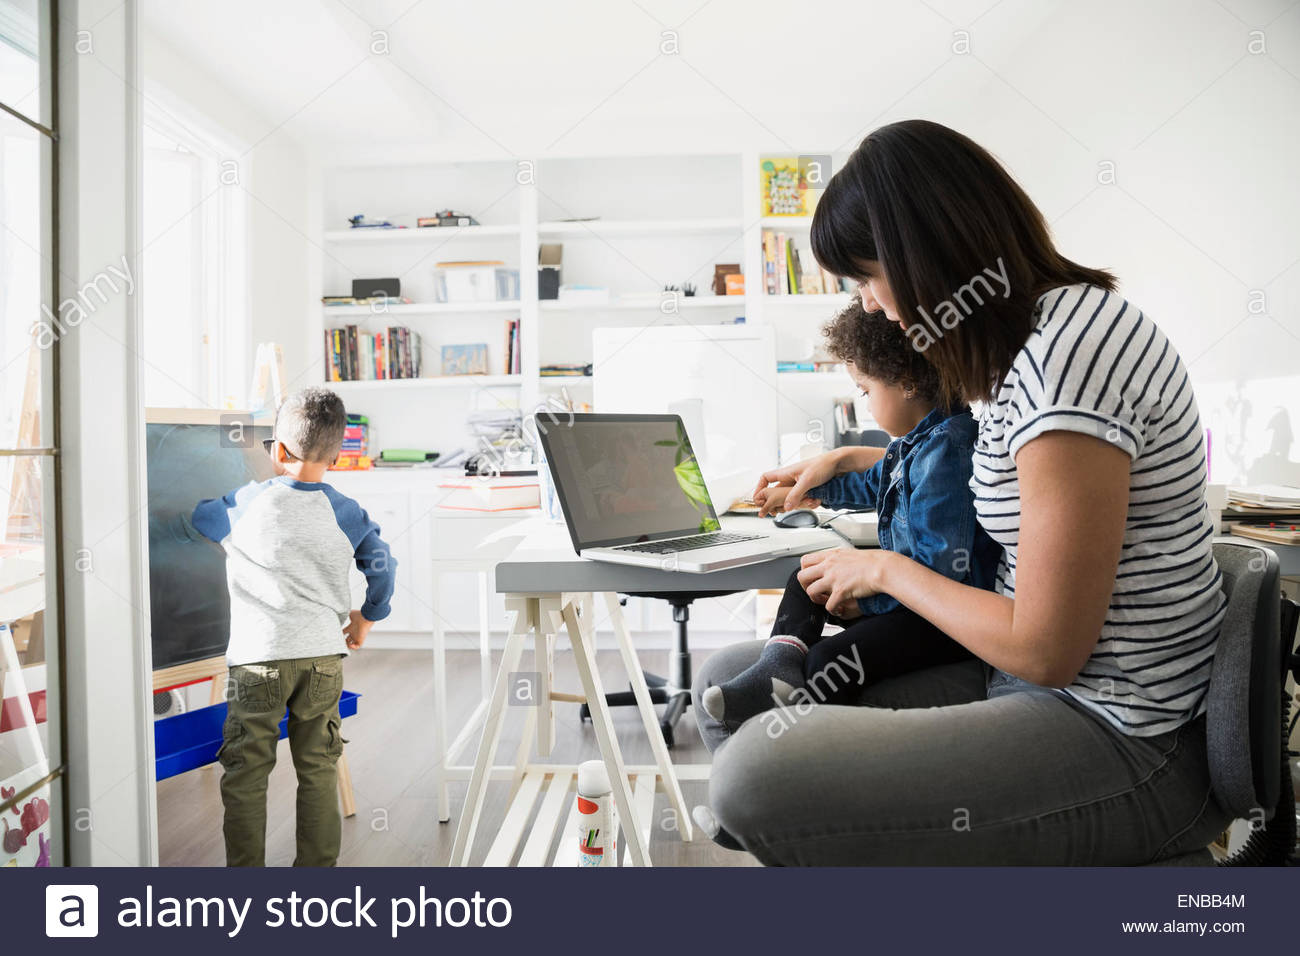 Mutter und Tochter am Laptop im home-office Stockbild